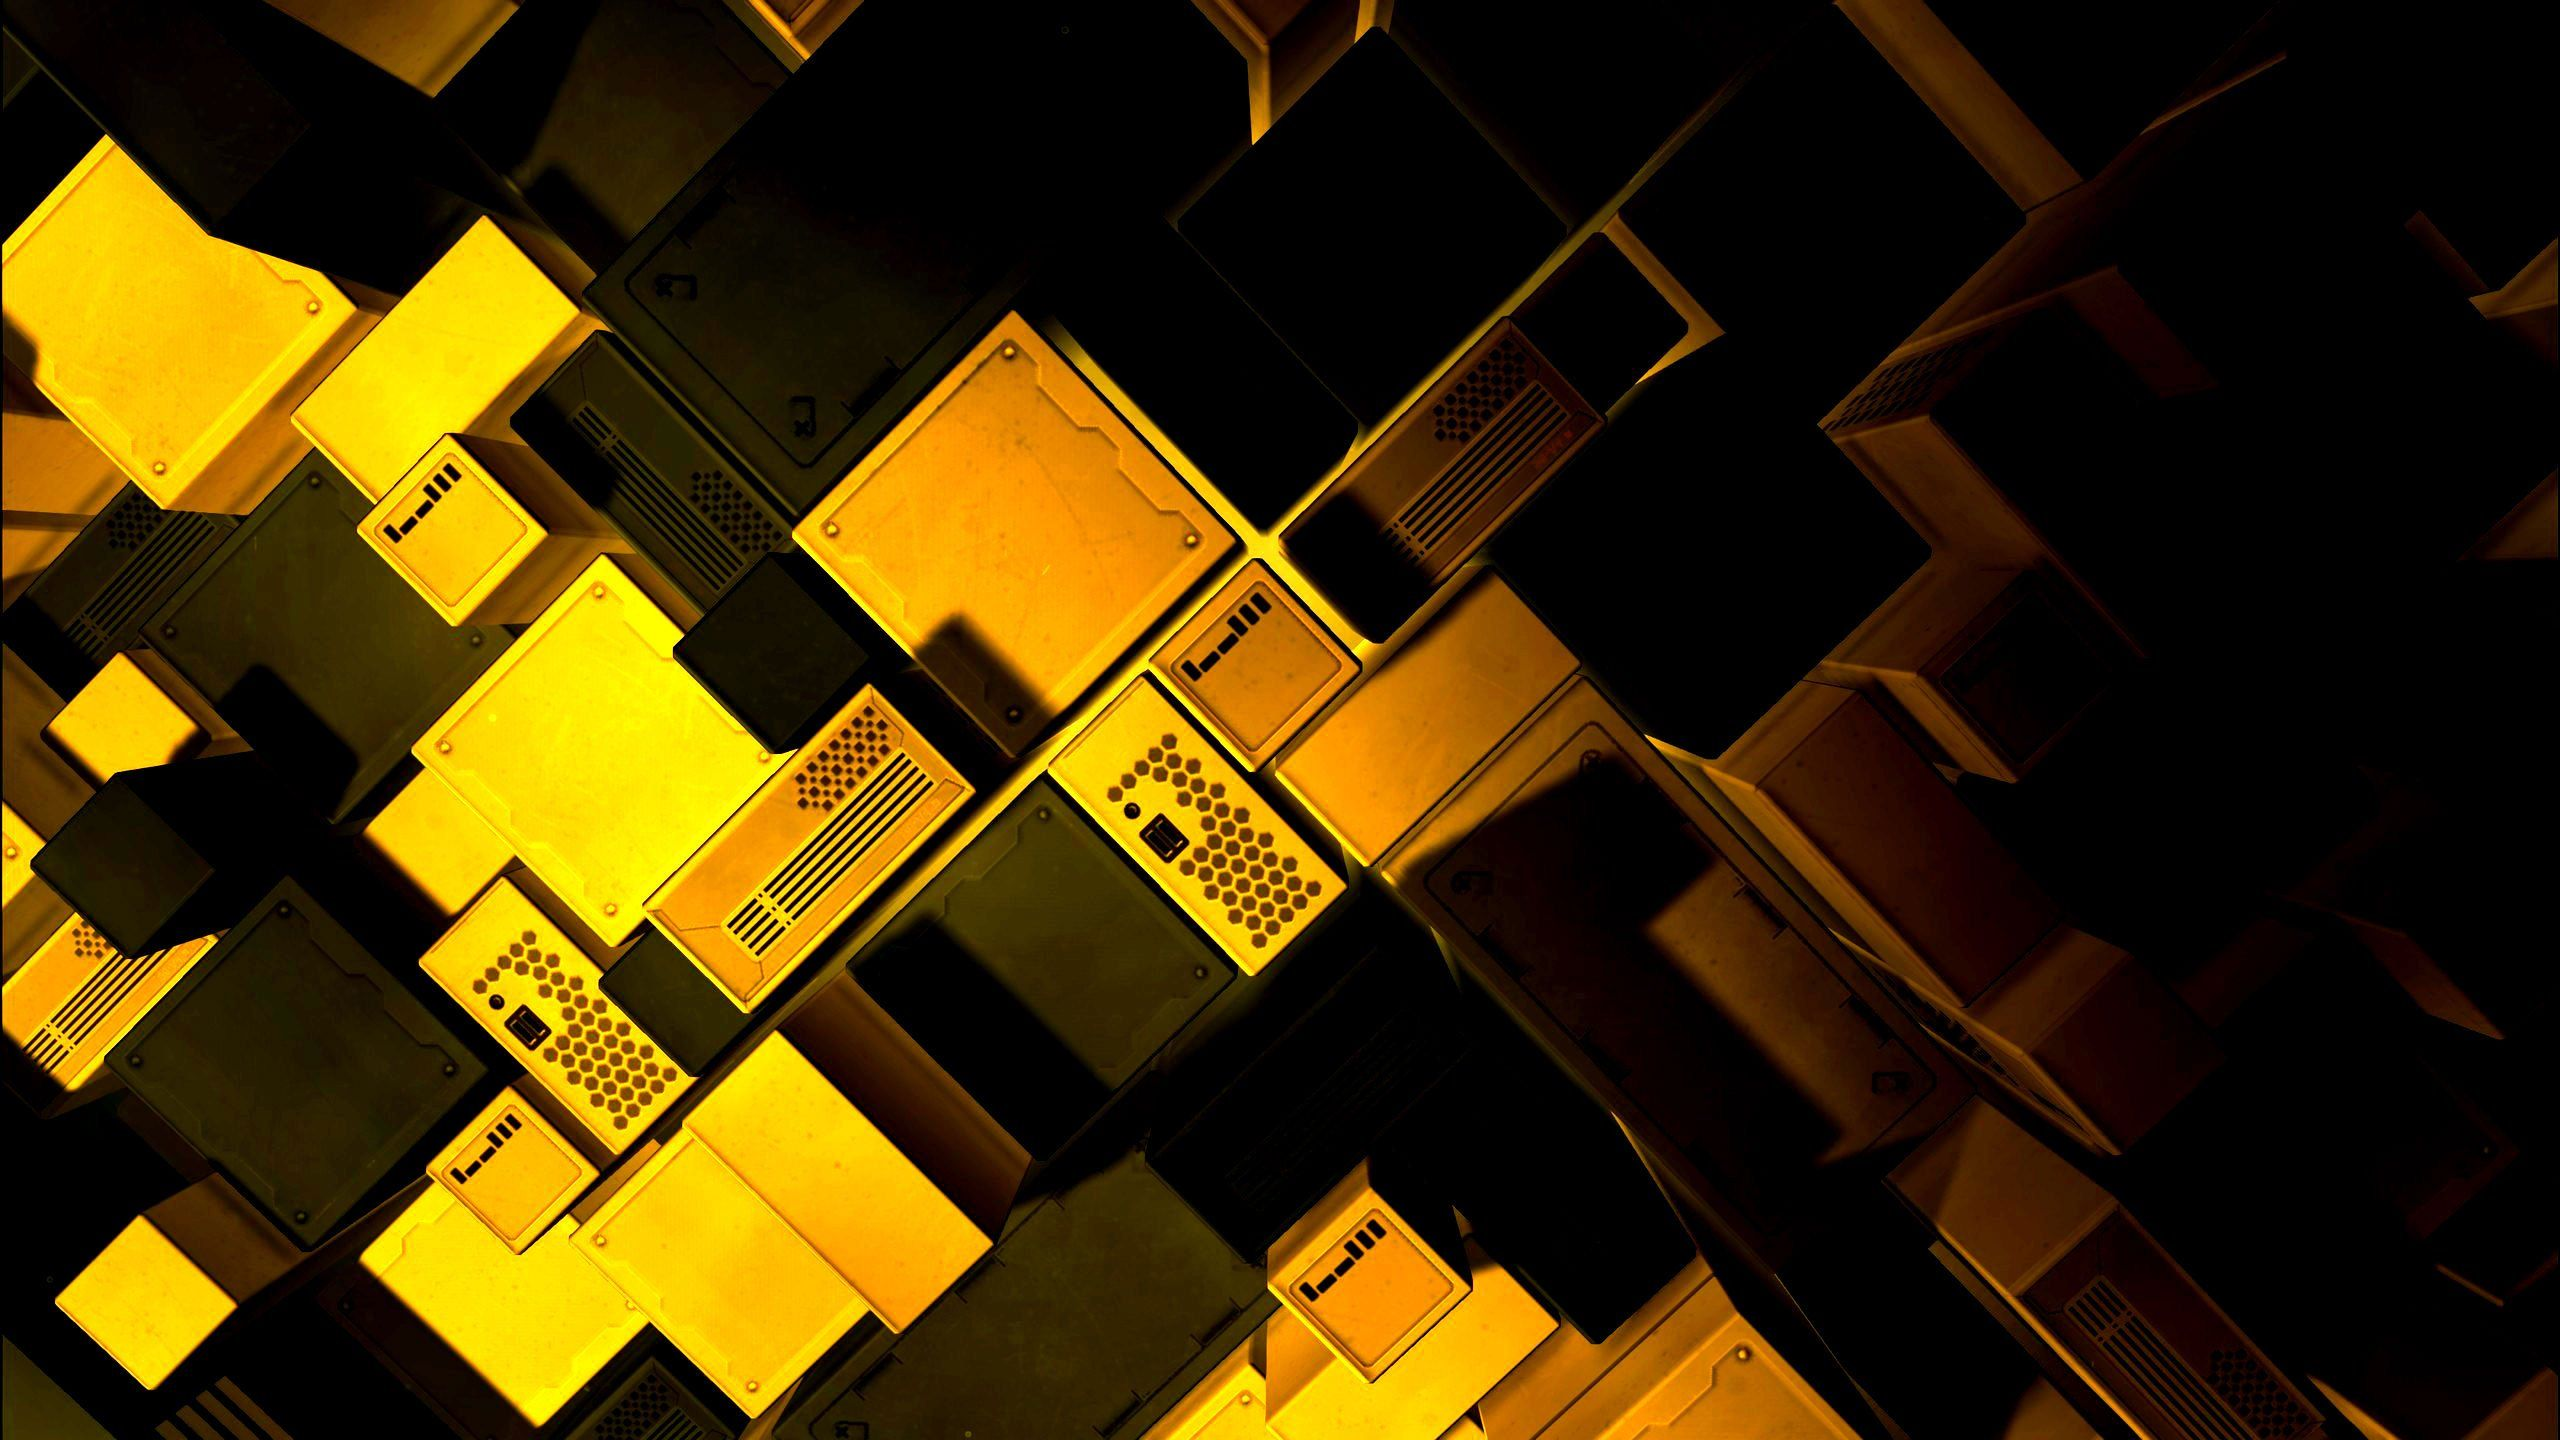 Dark Souls Animated Wallpaper Deus Ex Human Revolution Wallpapers Hd Pixelstalk Net